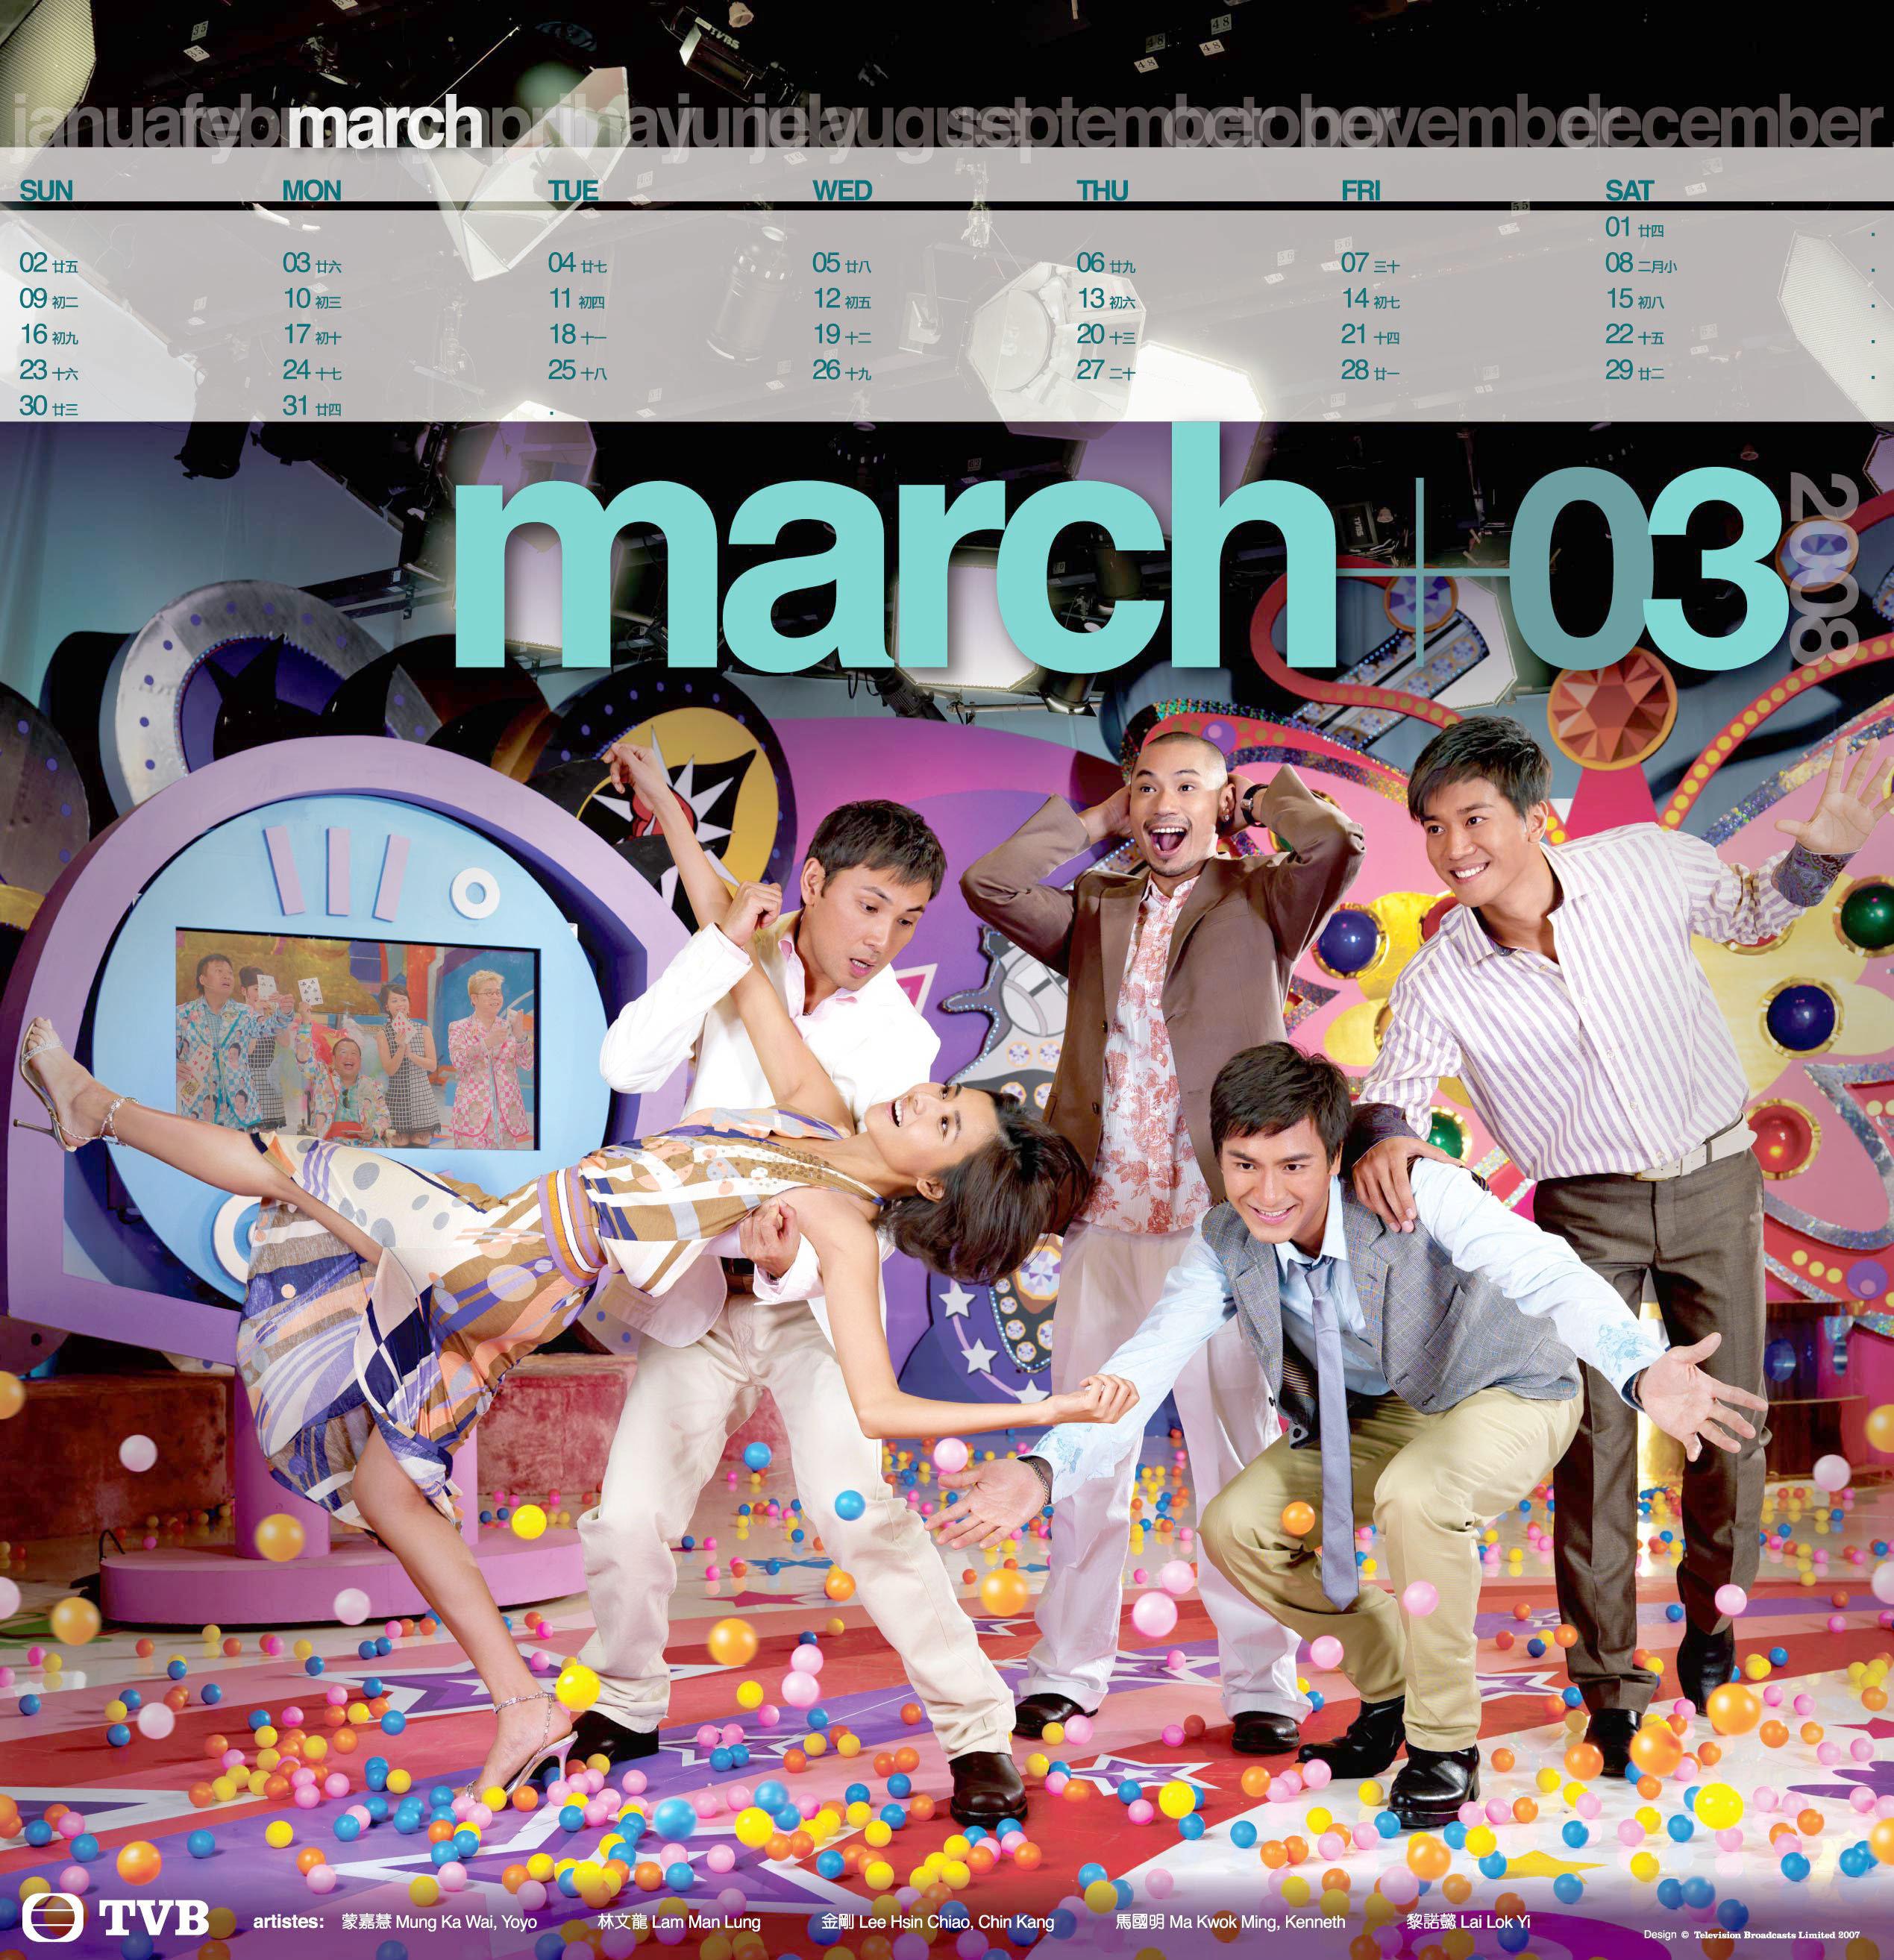 Hong Kong TVB calendar March 2008